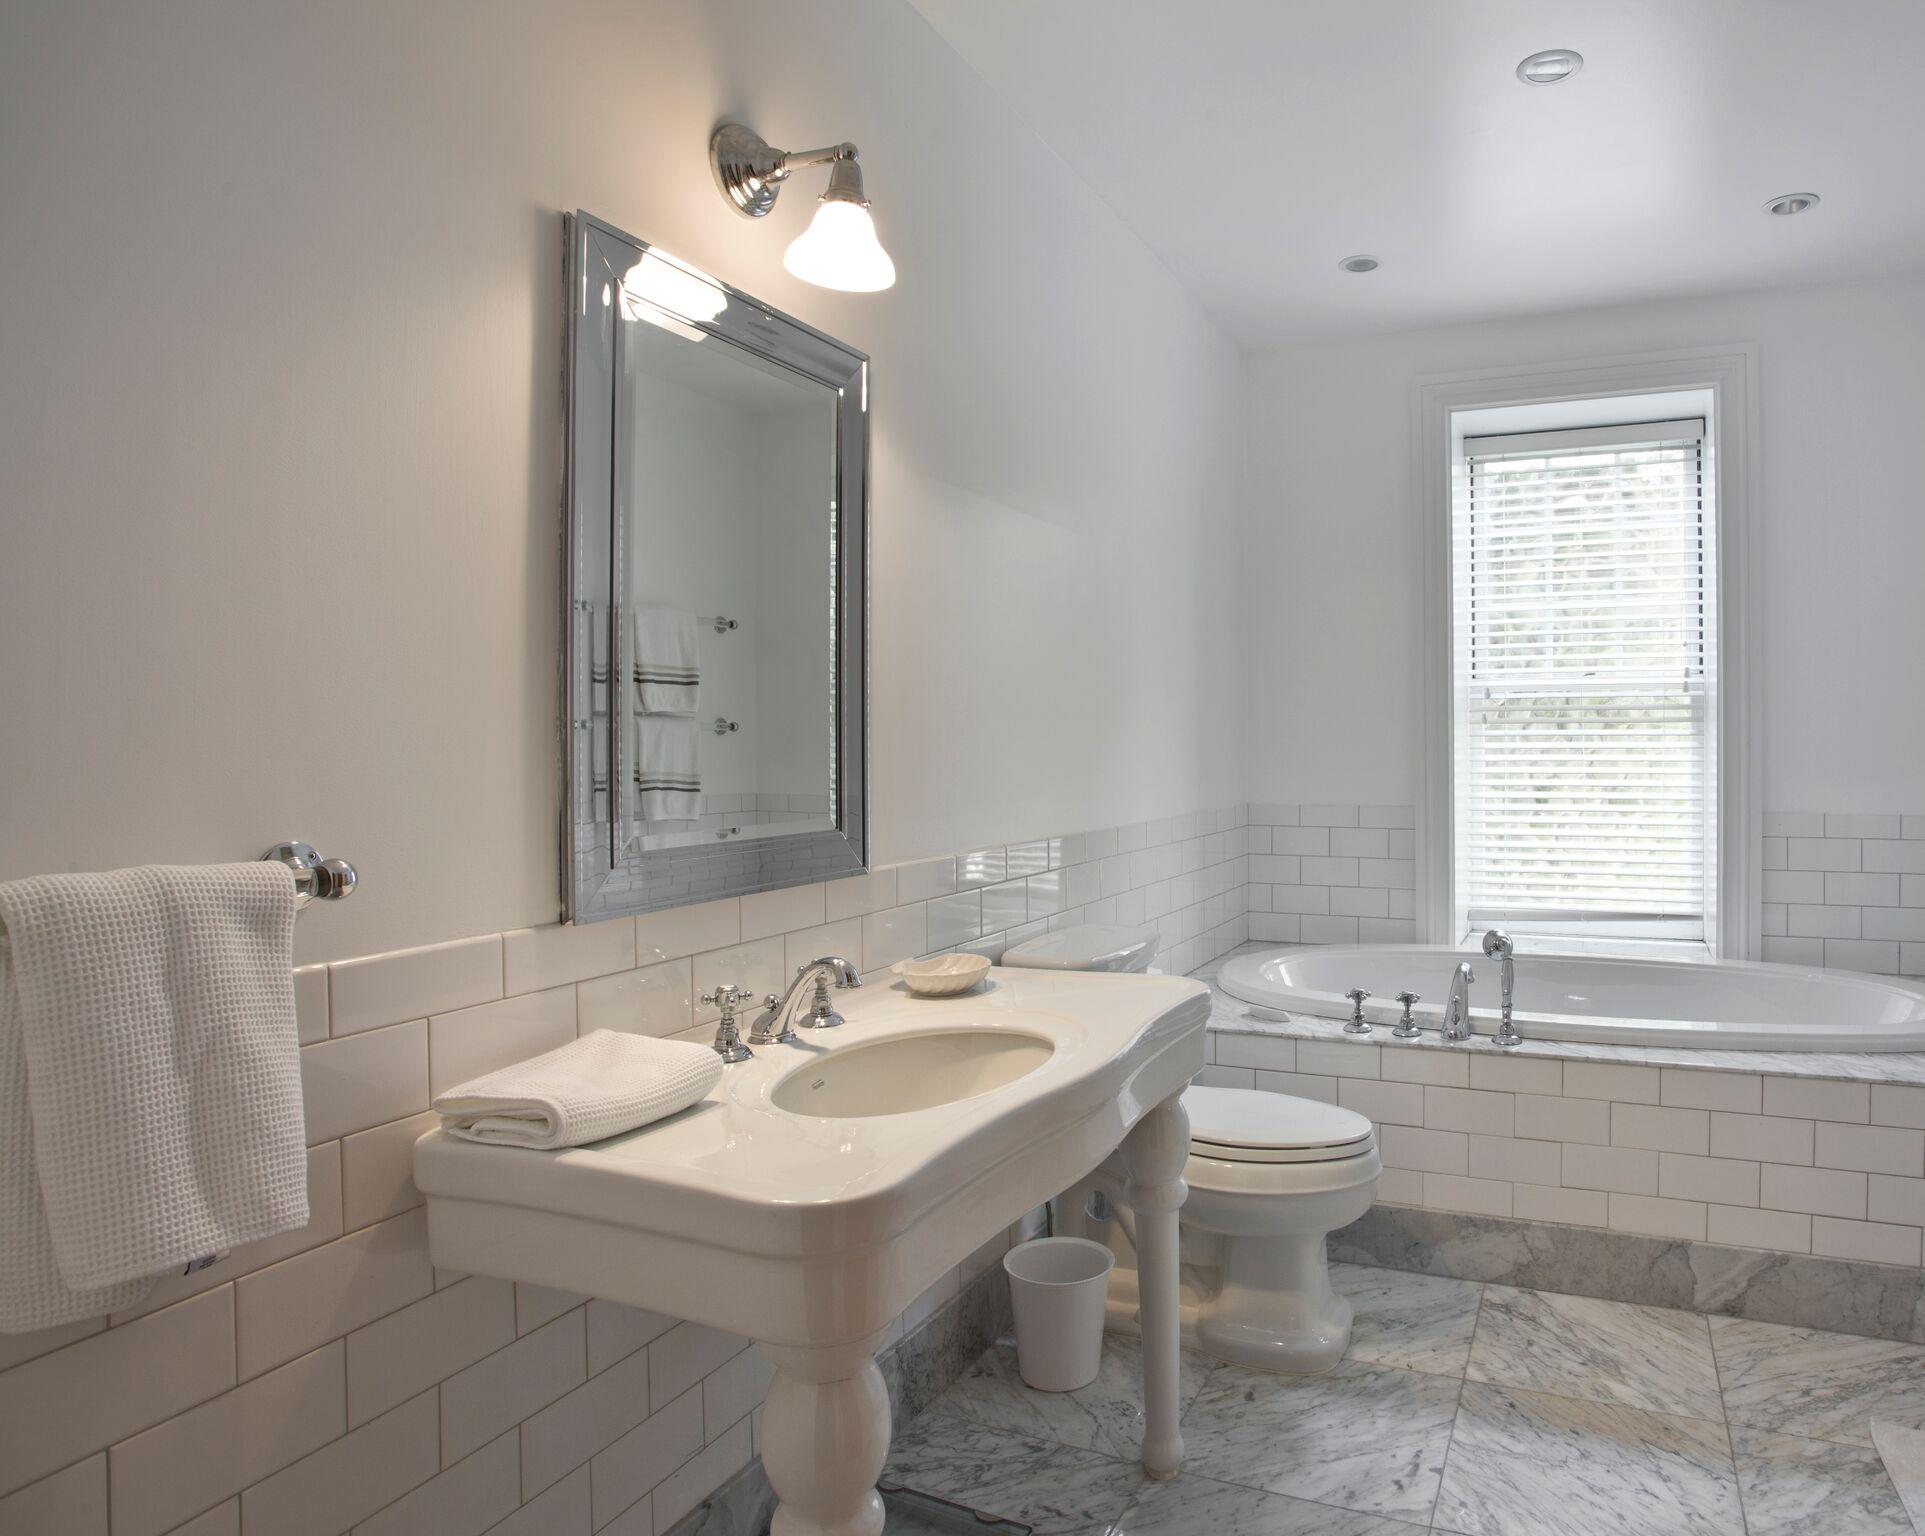 44-Sunrise-Bathroom-4_preview.jpg